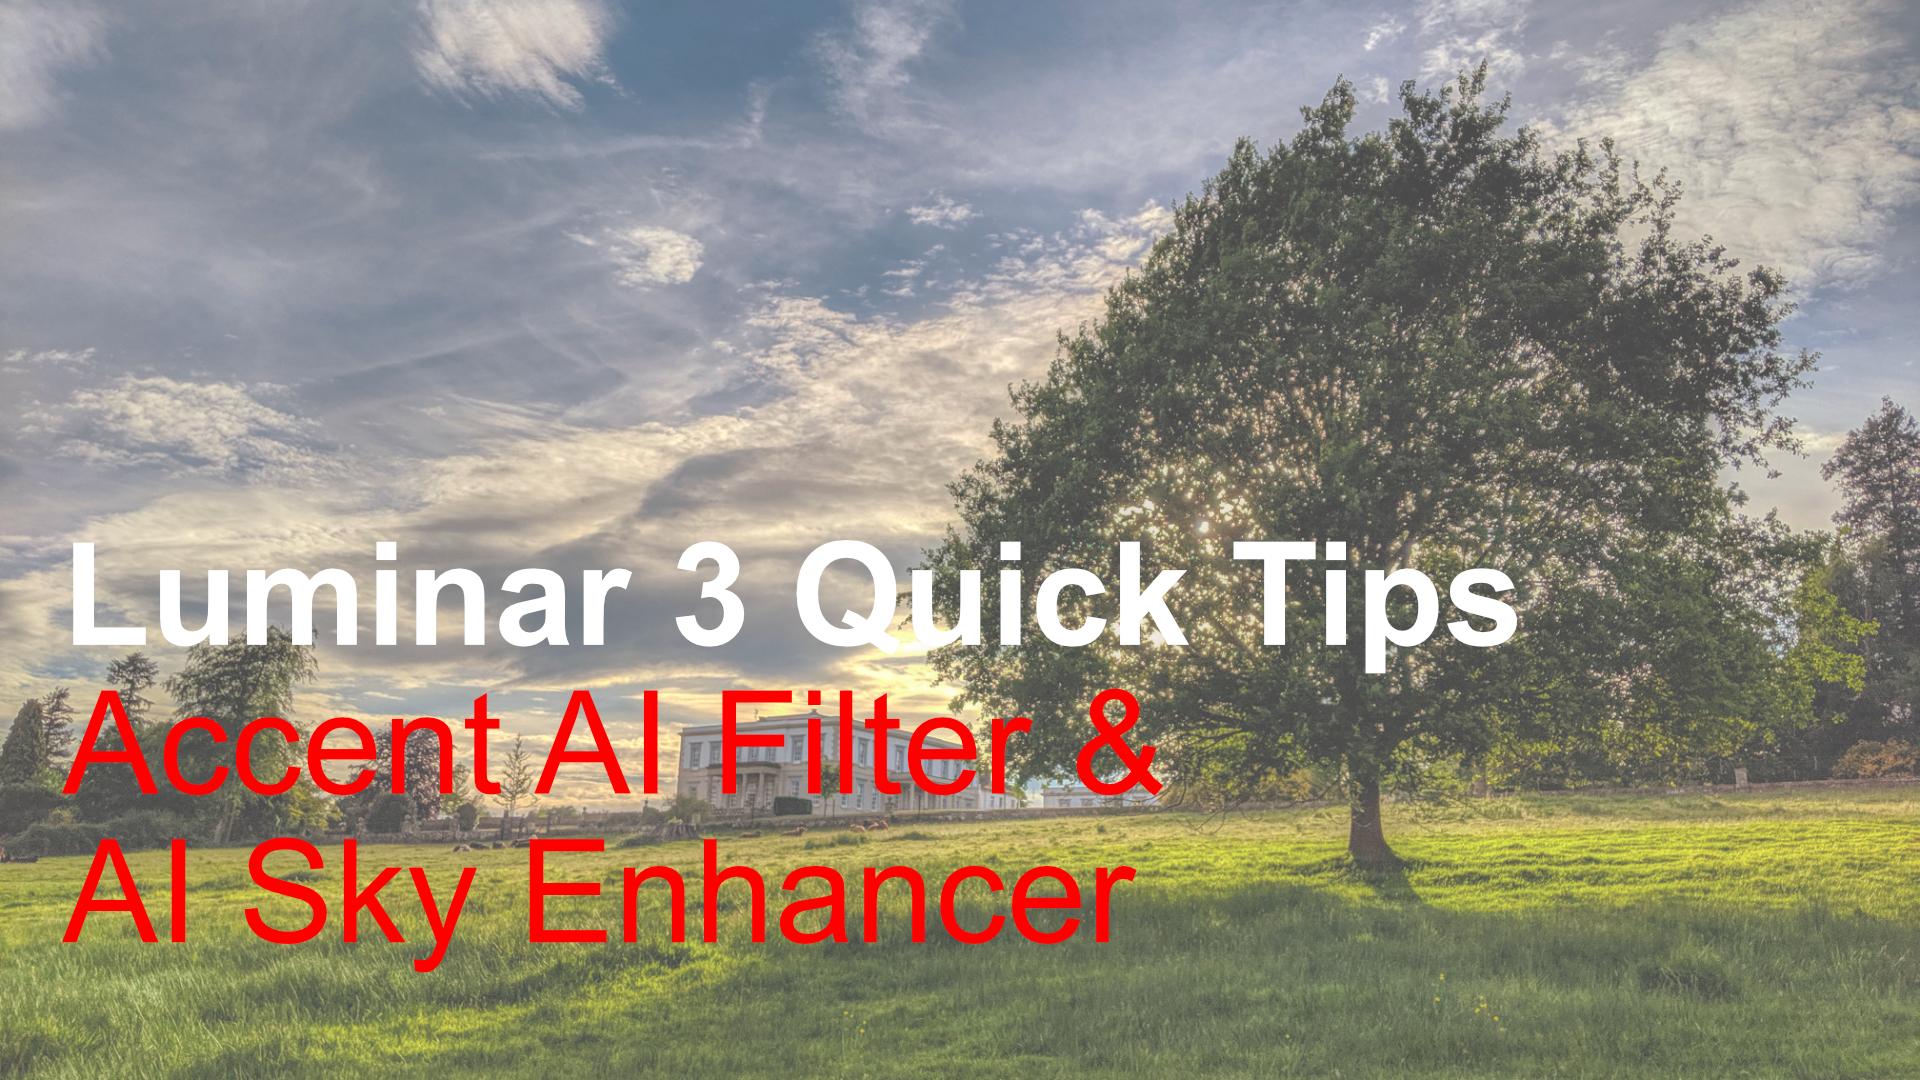 Luminar 3 Quick Tips   Accent AI Filter & AI Sky Enhancer